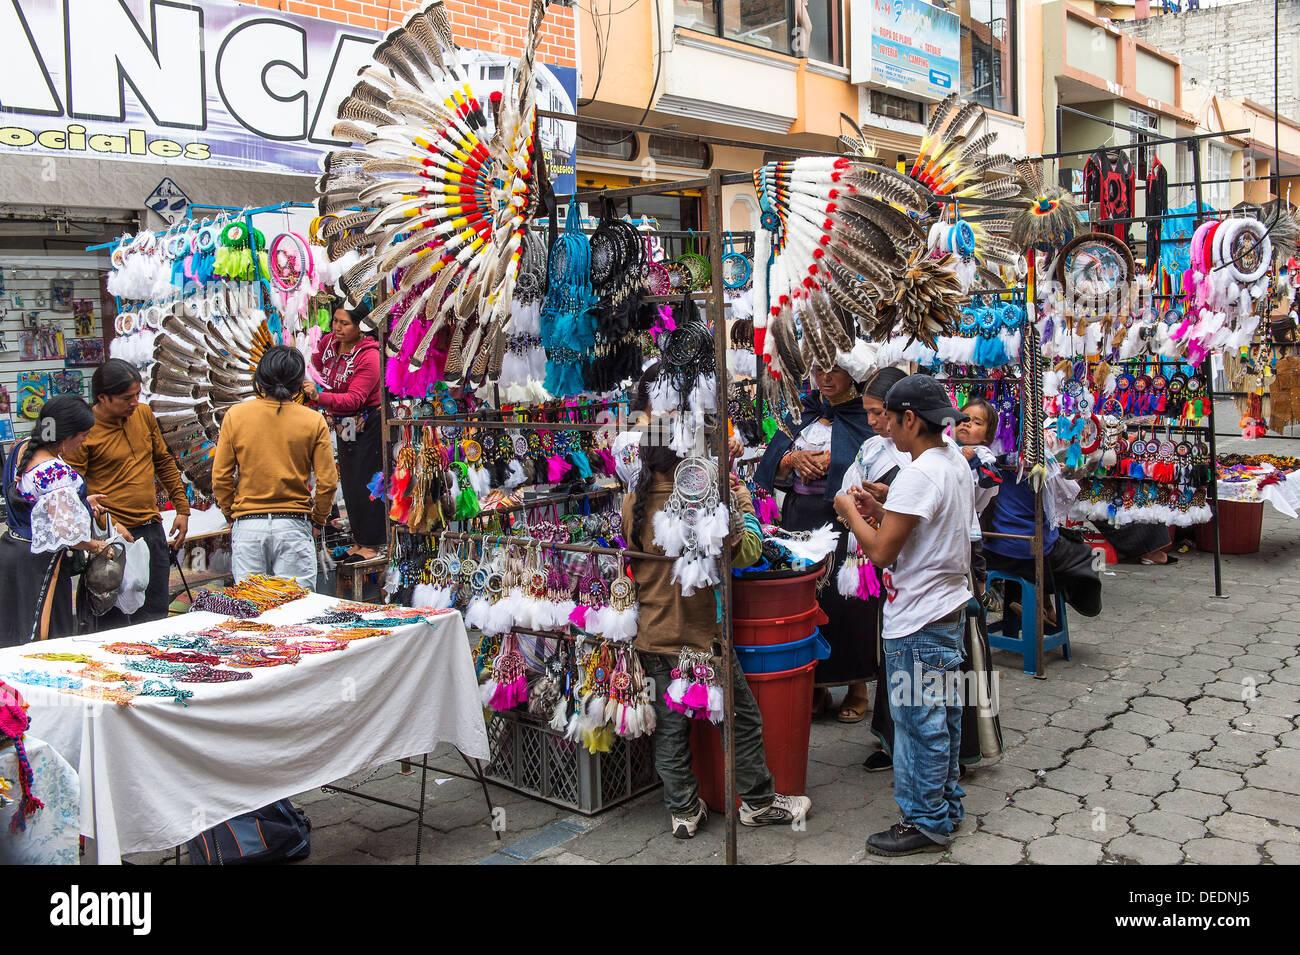 Street scene, Otavalo market, Imbabura Province, Ecuador, South America - Stock Image